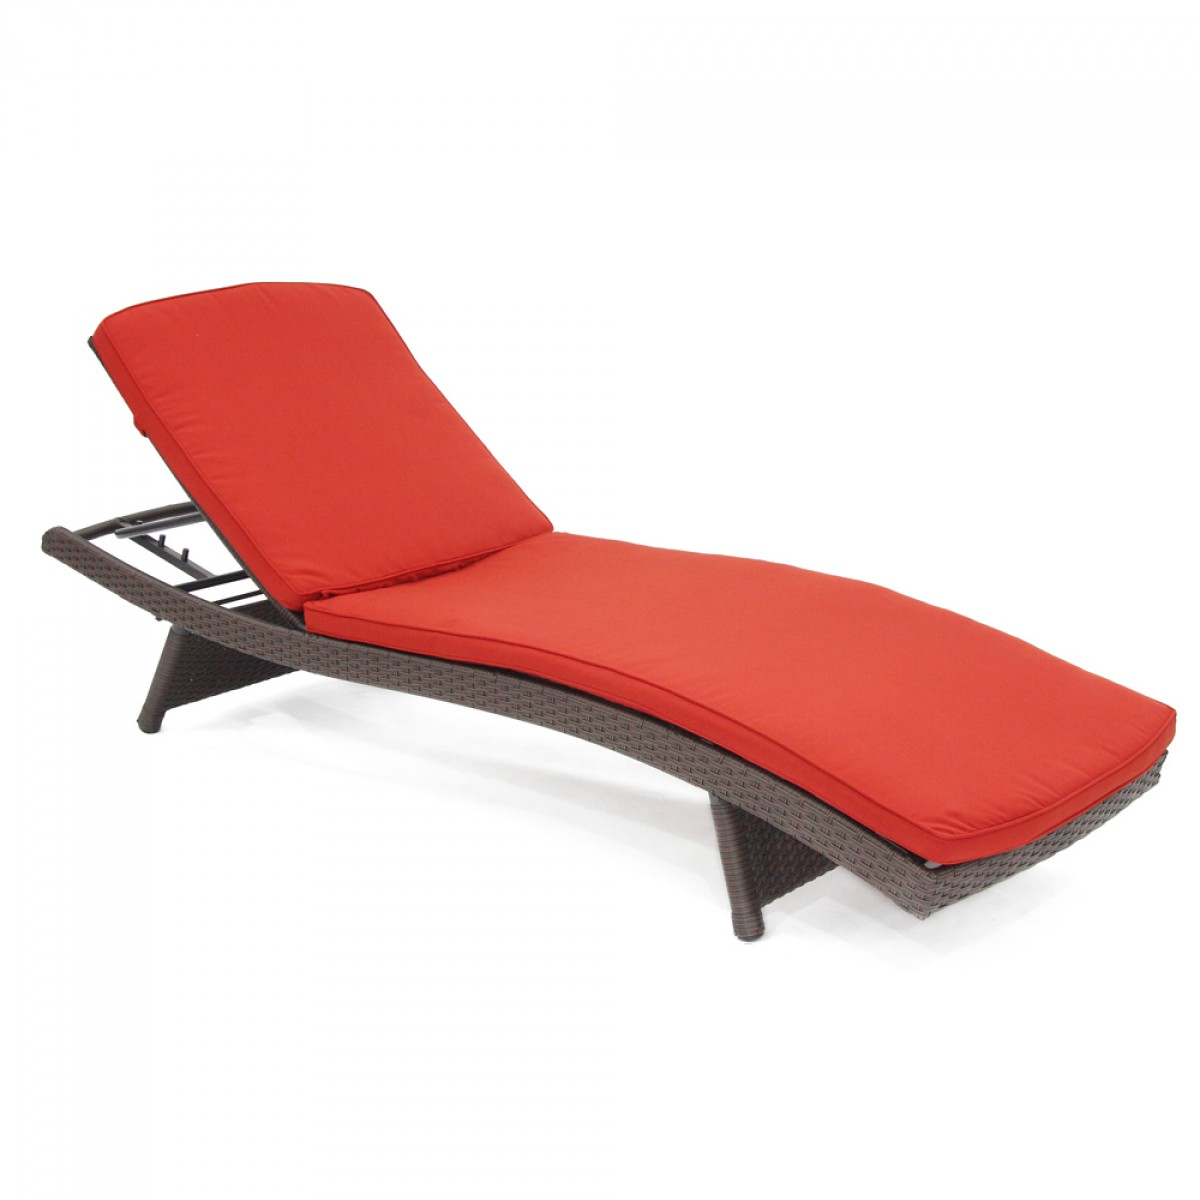 Dark red chaise lounger cushion for Chaise cushions